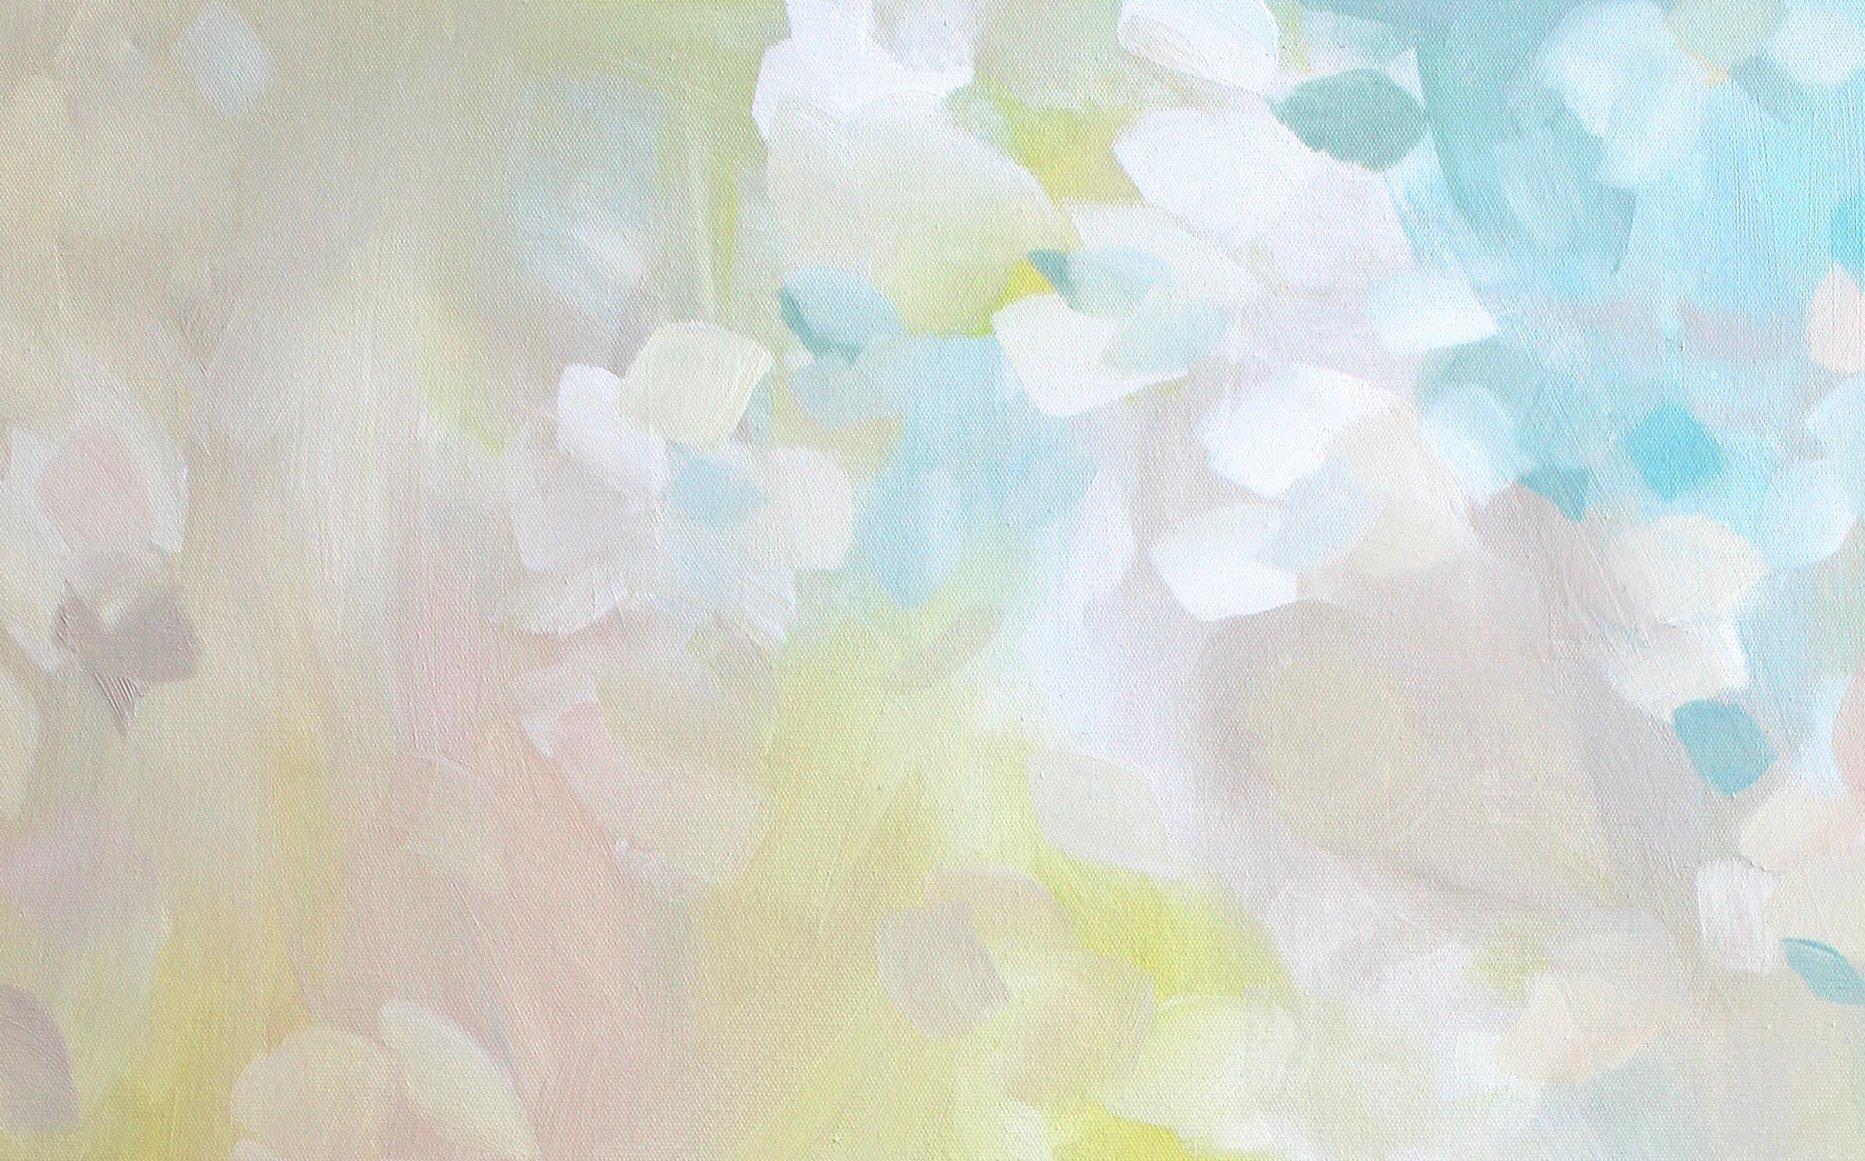 Bodega Tulips 8x10 Print